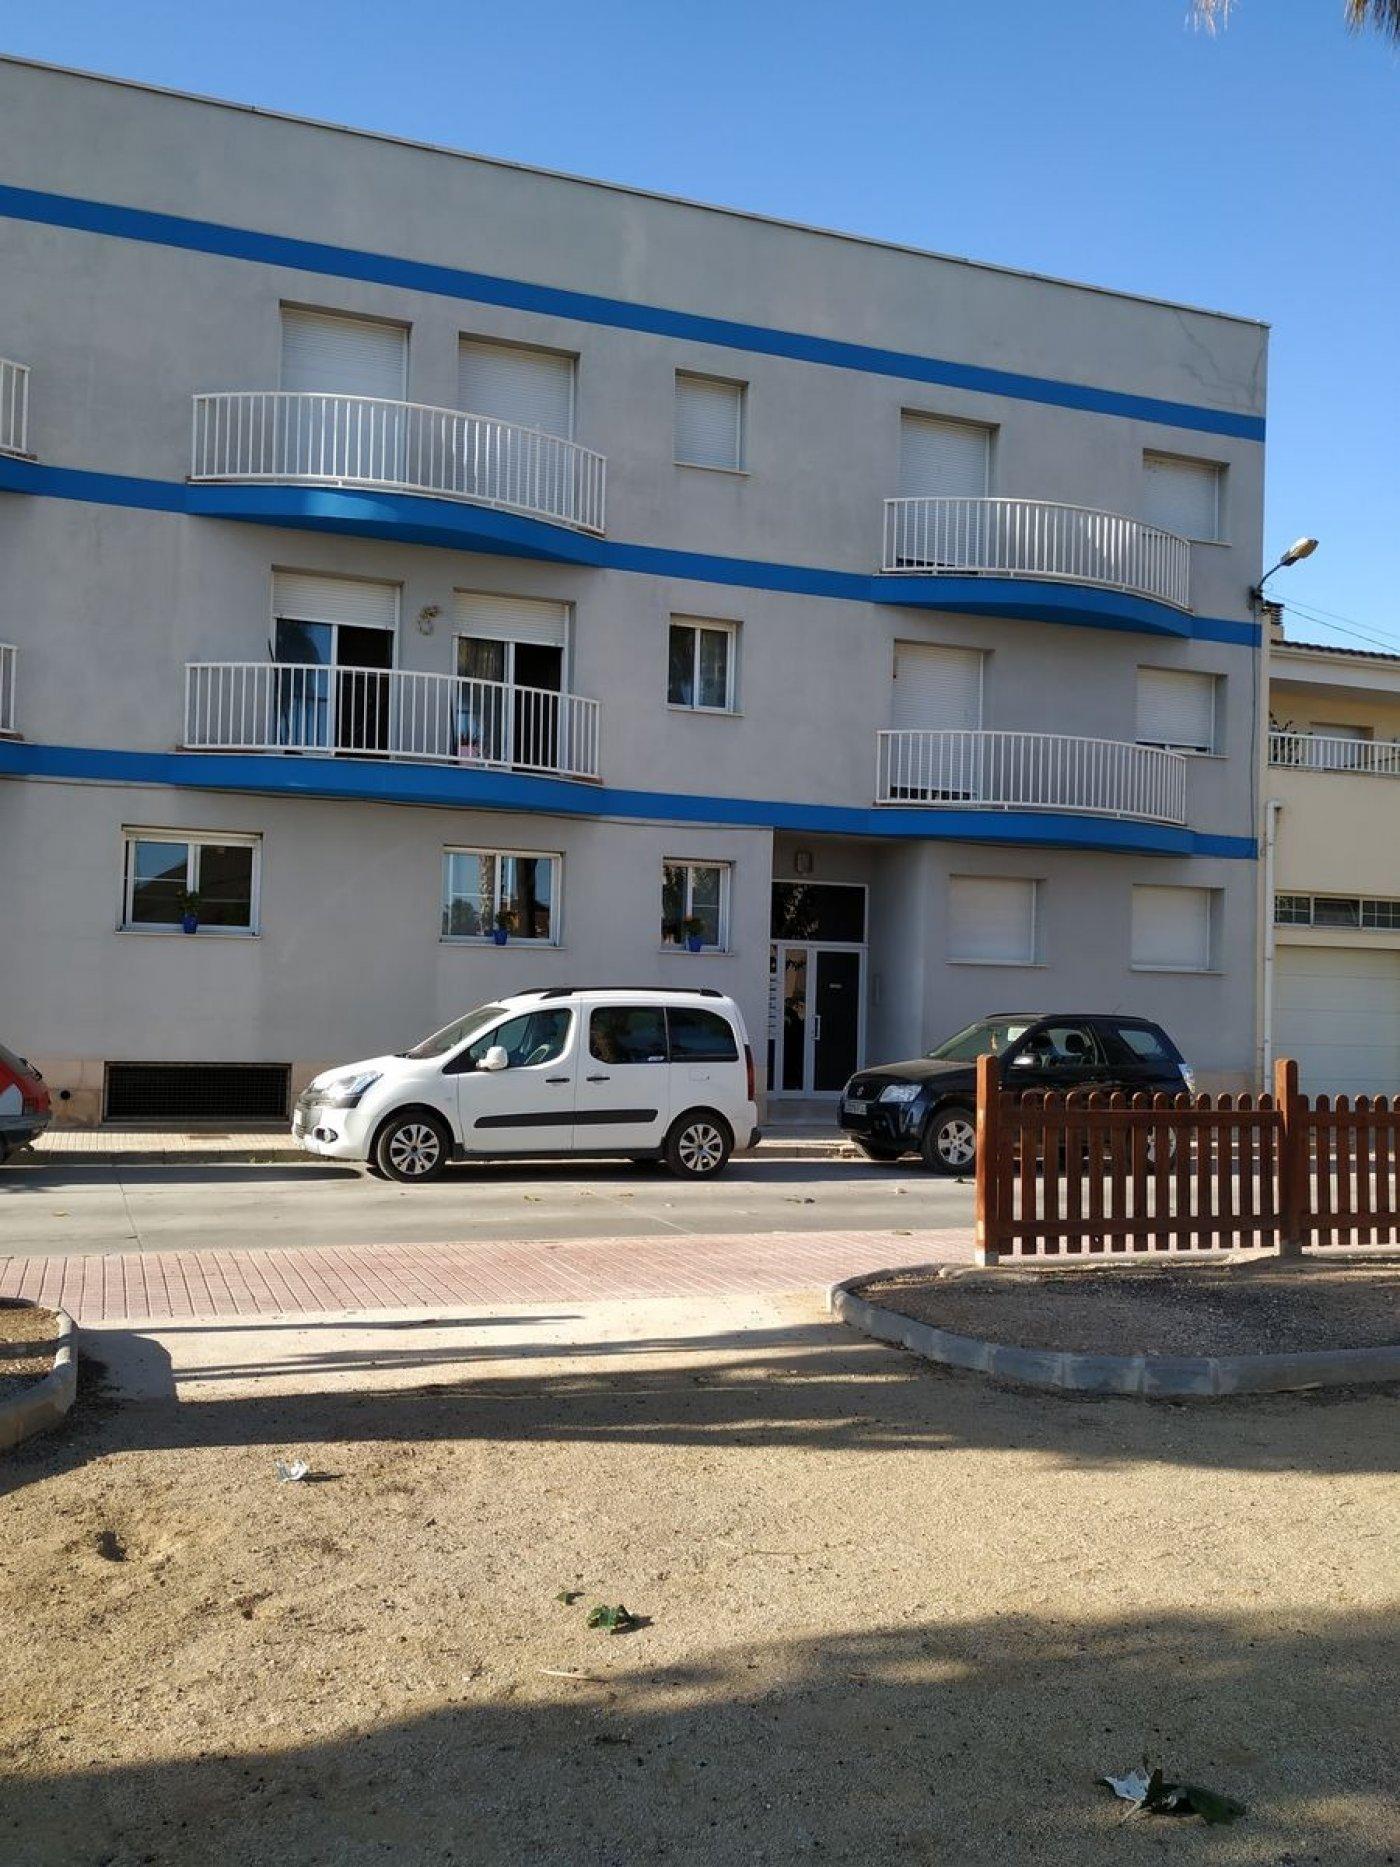 Flat for sale in Sant jaume, Sant Jaume d'Enveja